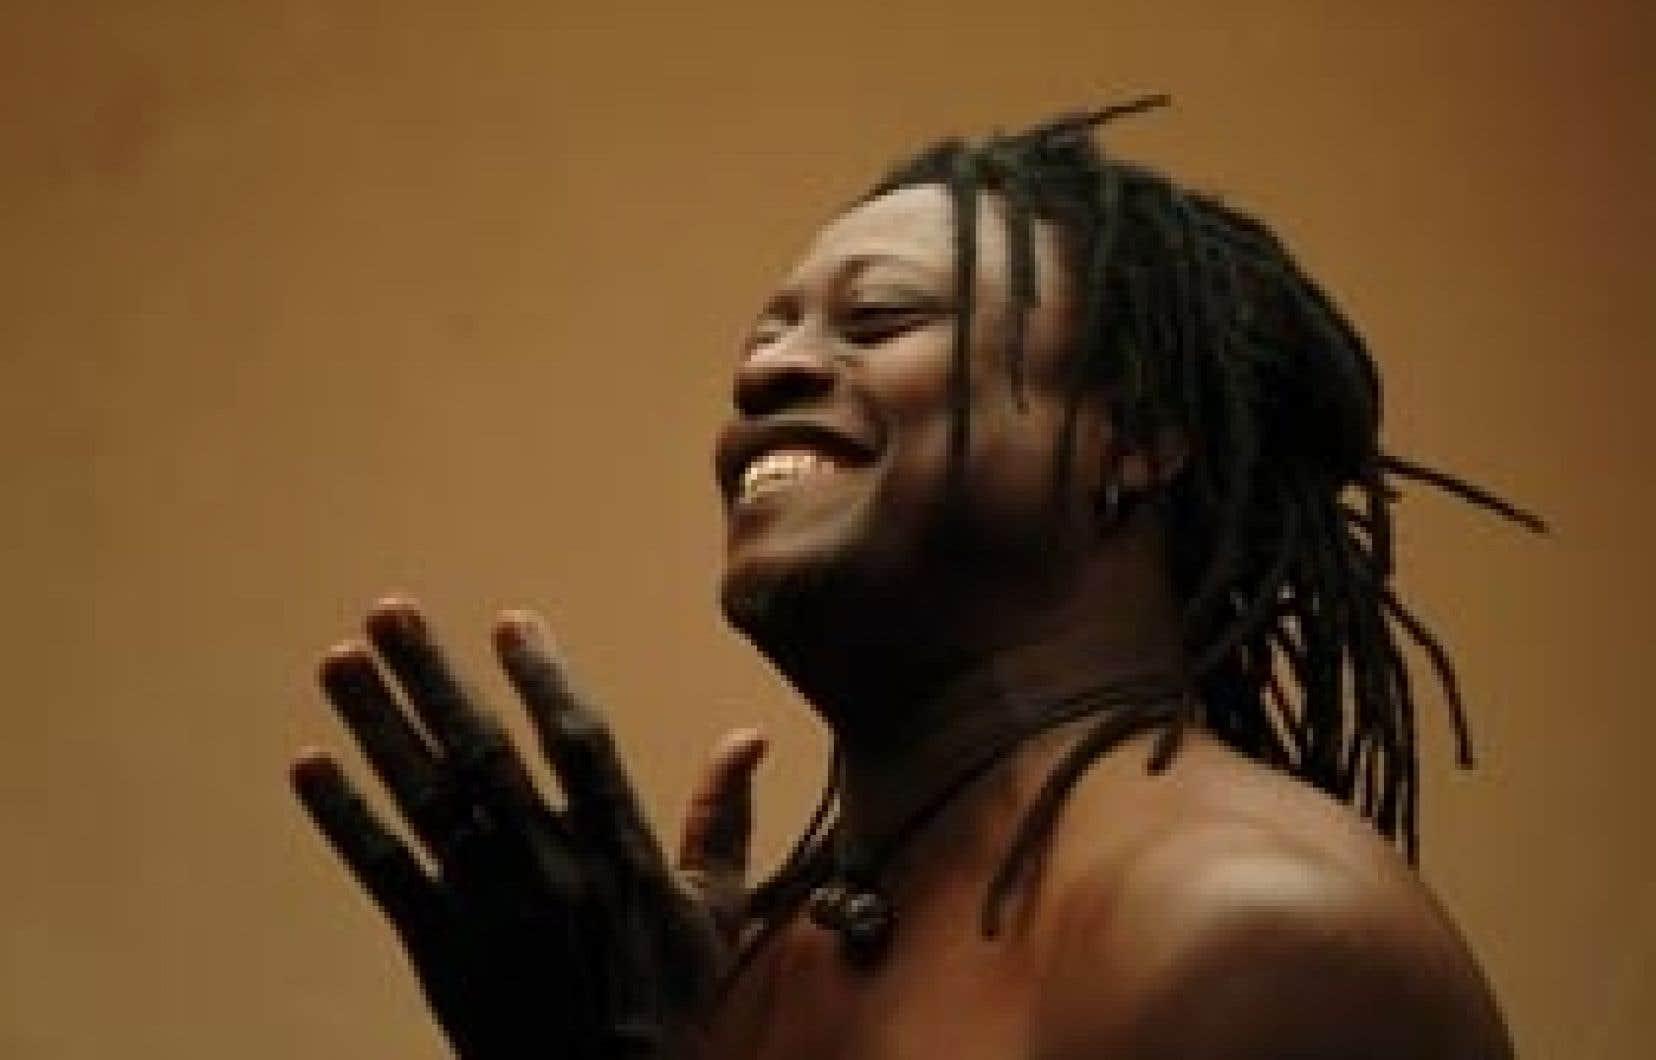 L'artiste malien Habib Koité